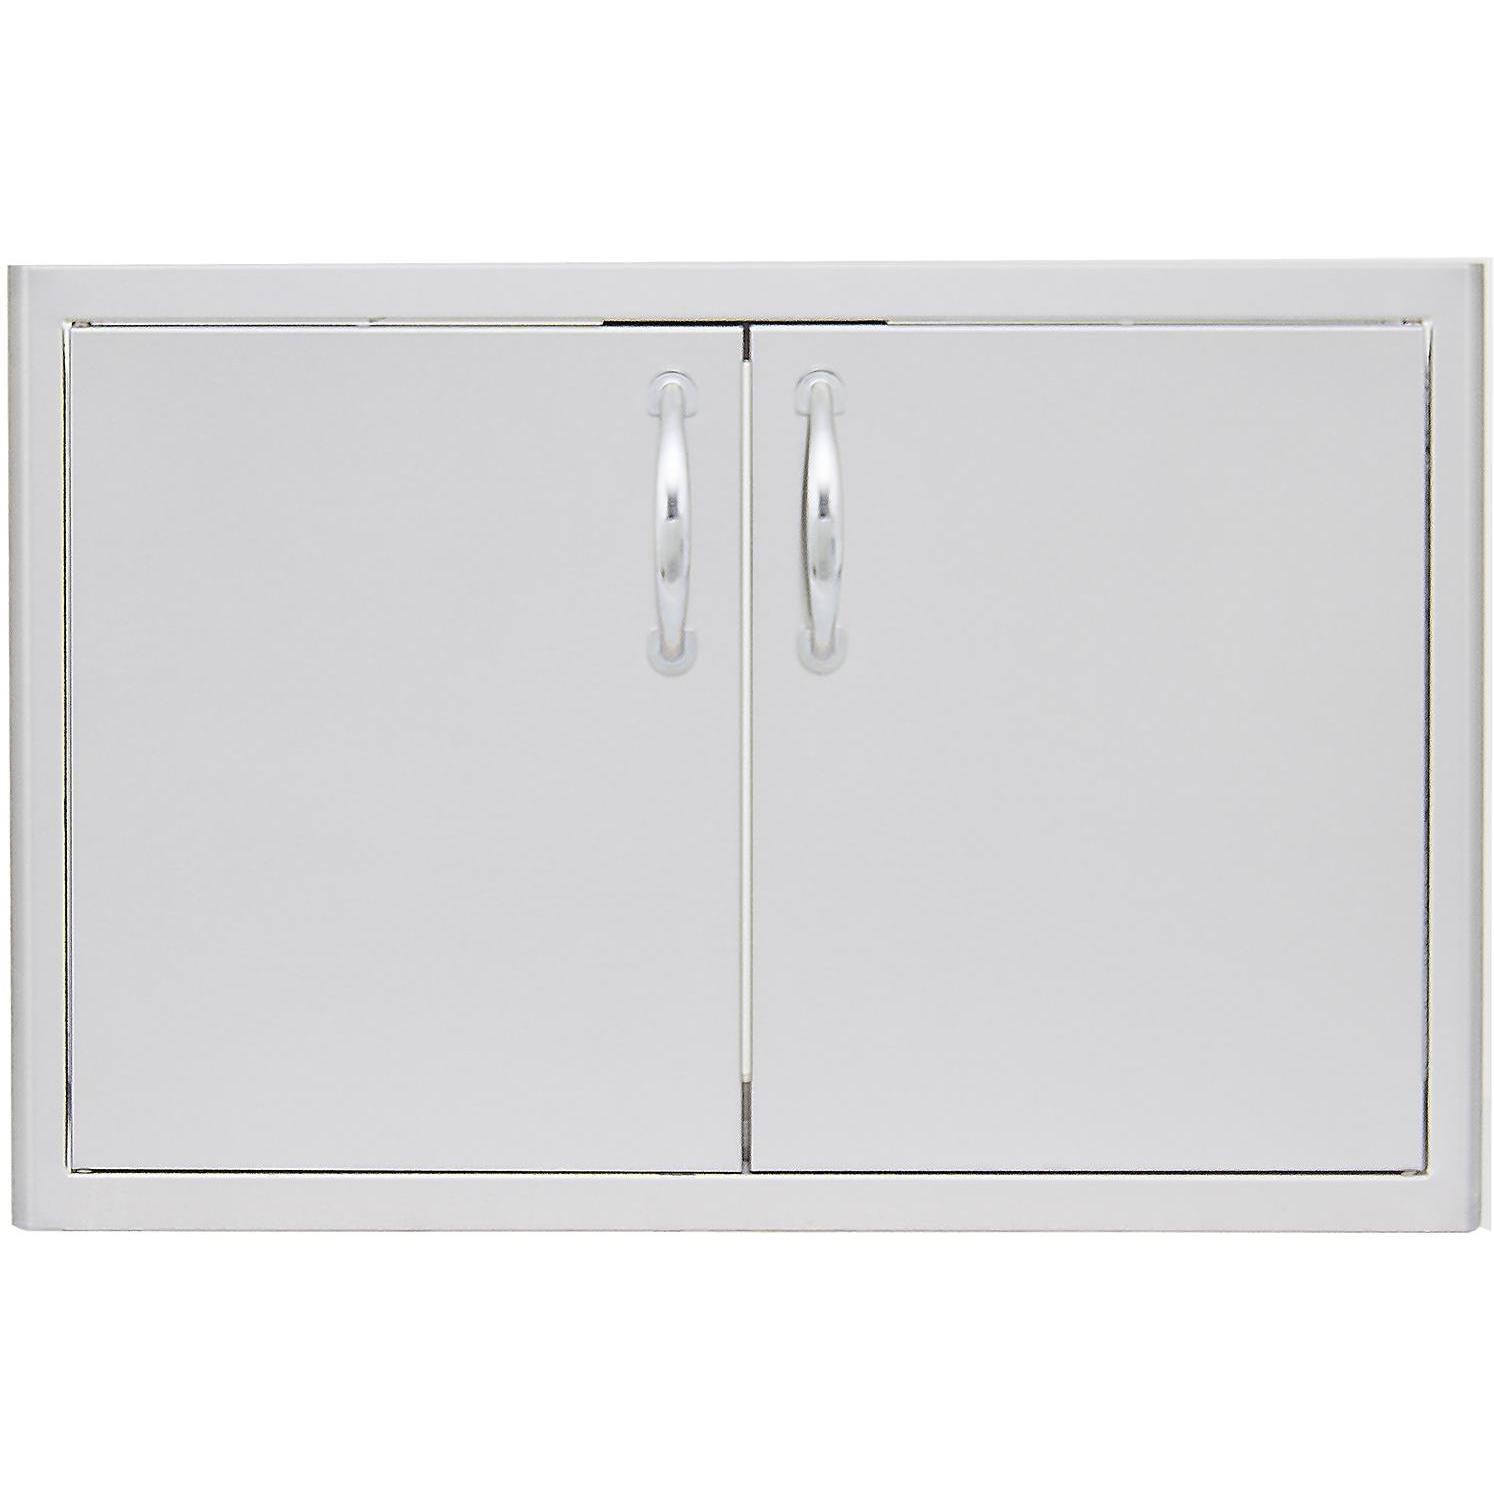 Double Access Door with Paper Towel Dispenser Size: 40'' W